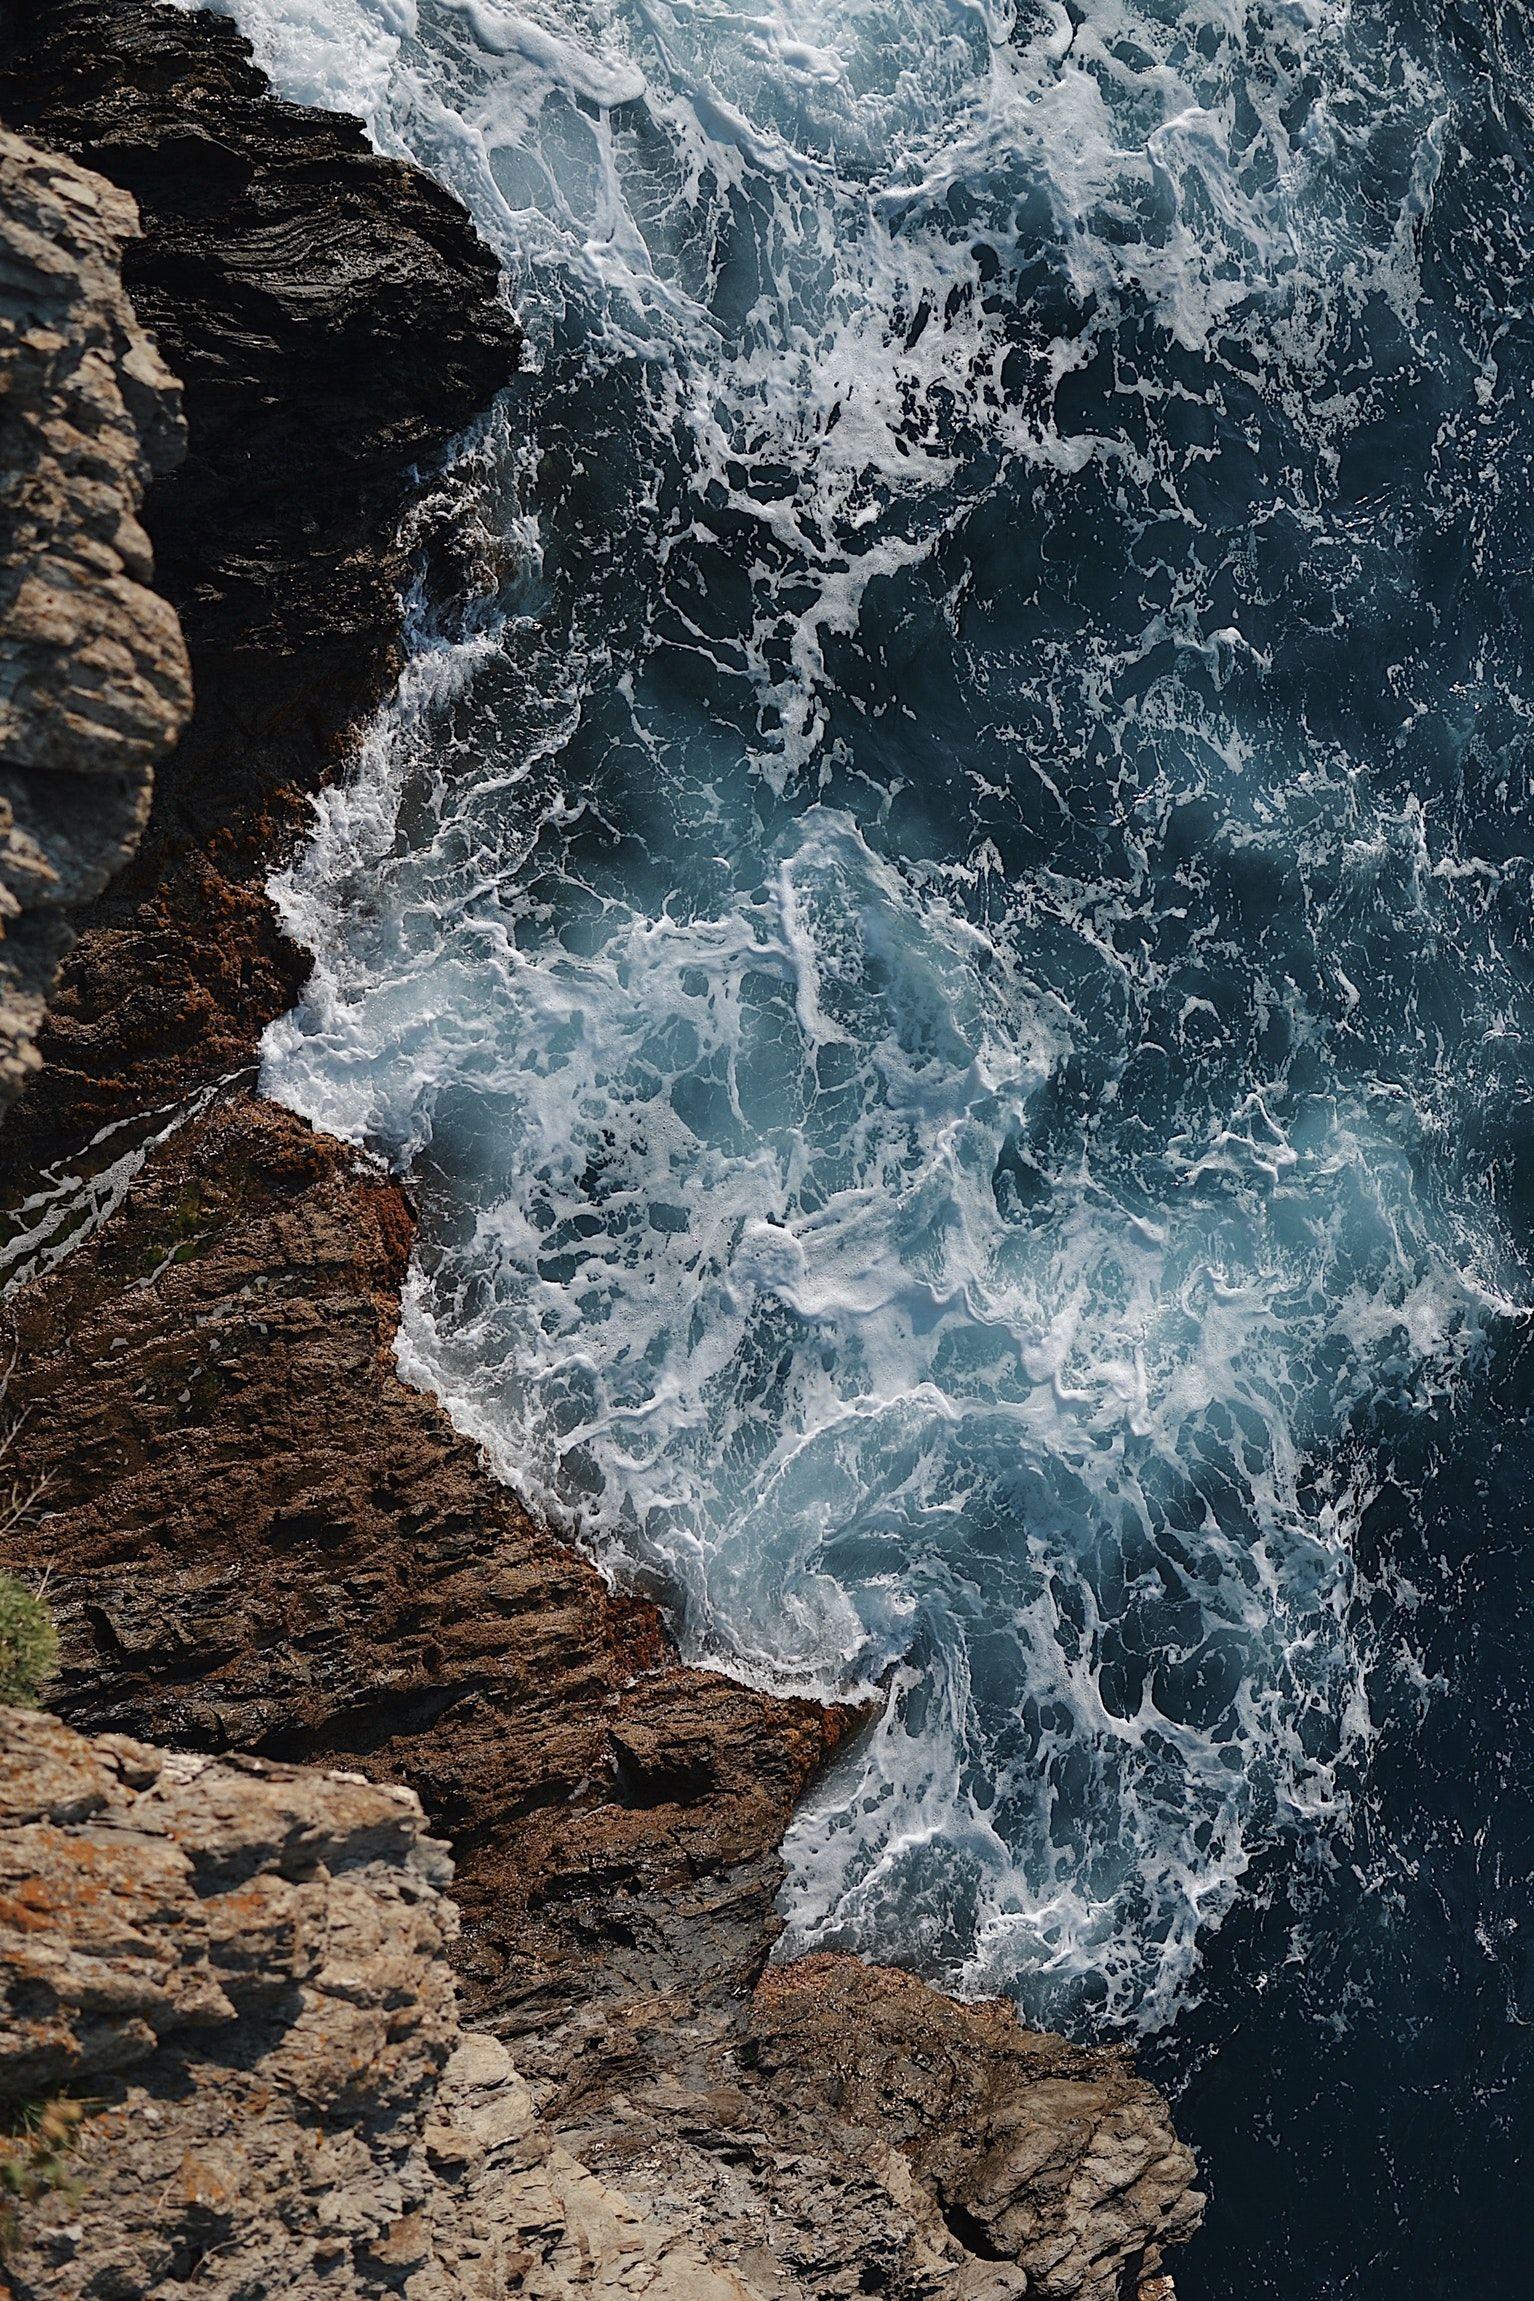 Waves Splashing On Gray Rocky Cliff During Daytime Iphone Wallpaper Sea Ocean Wallpaper Waves Wallpaper Wallpaper beach sea waves rocks coast